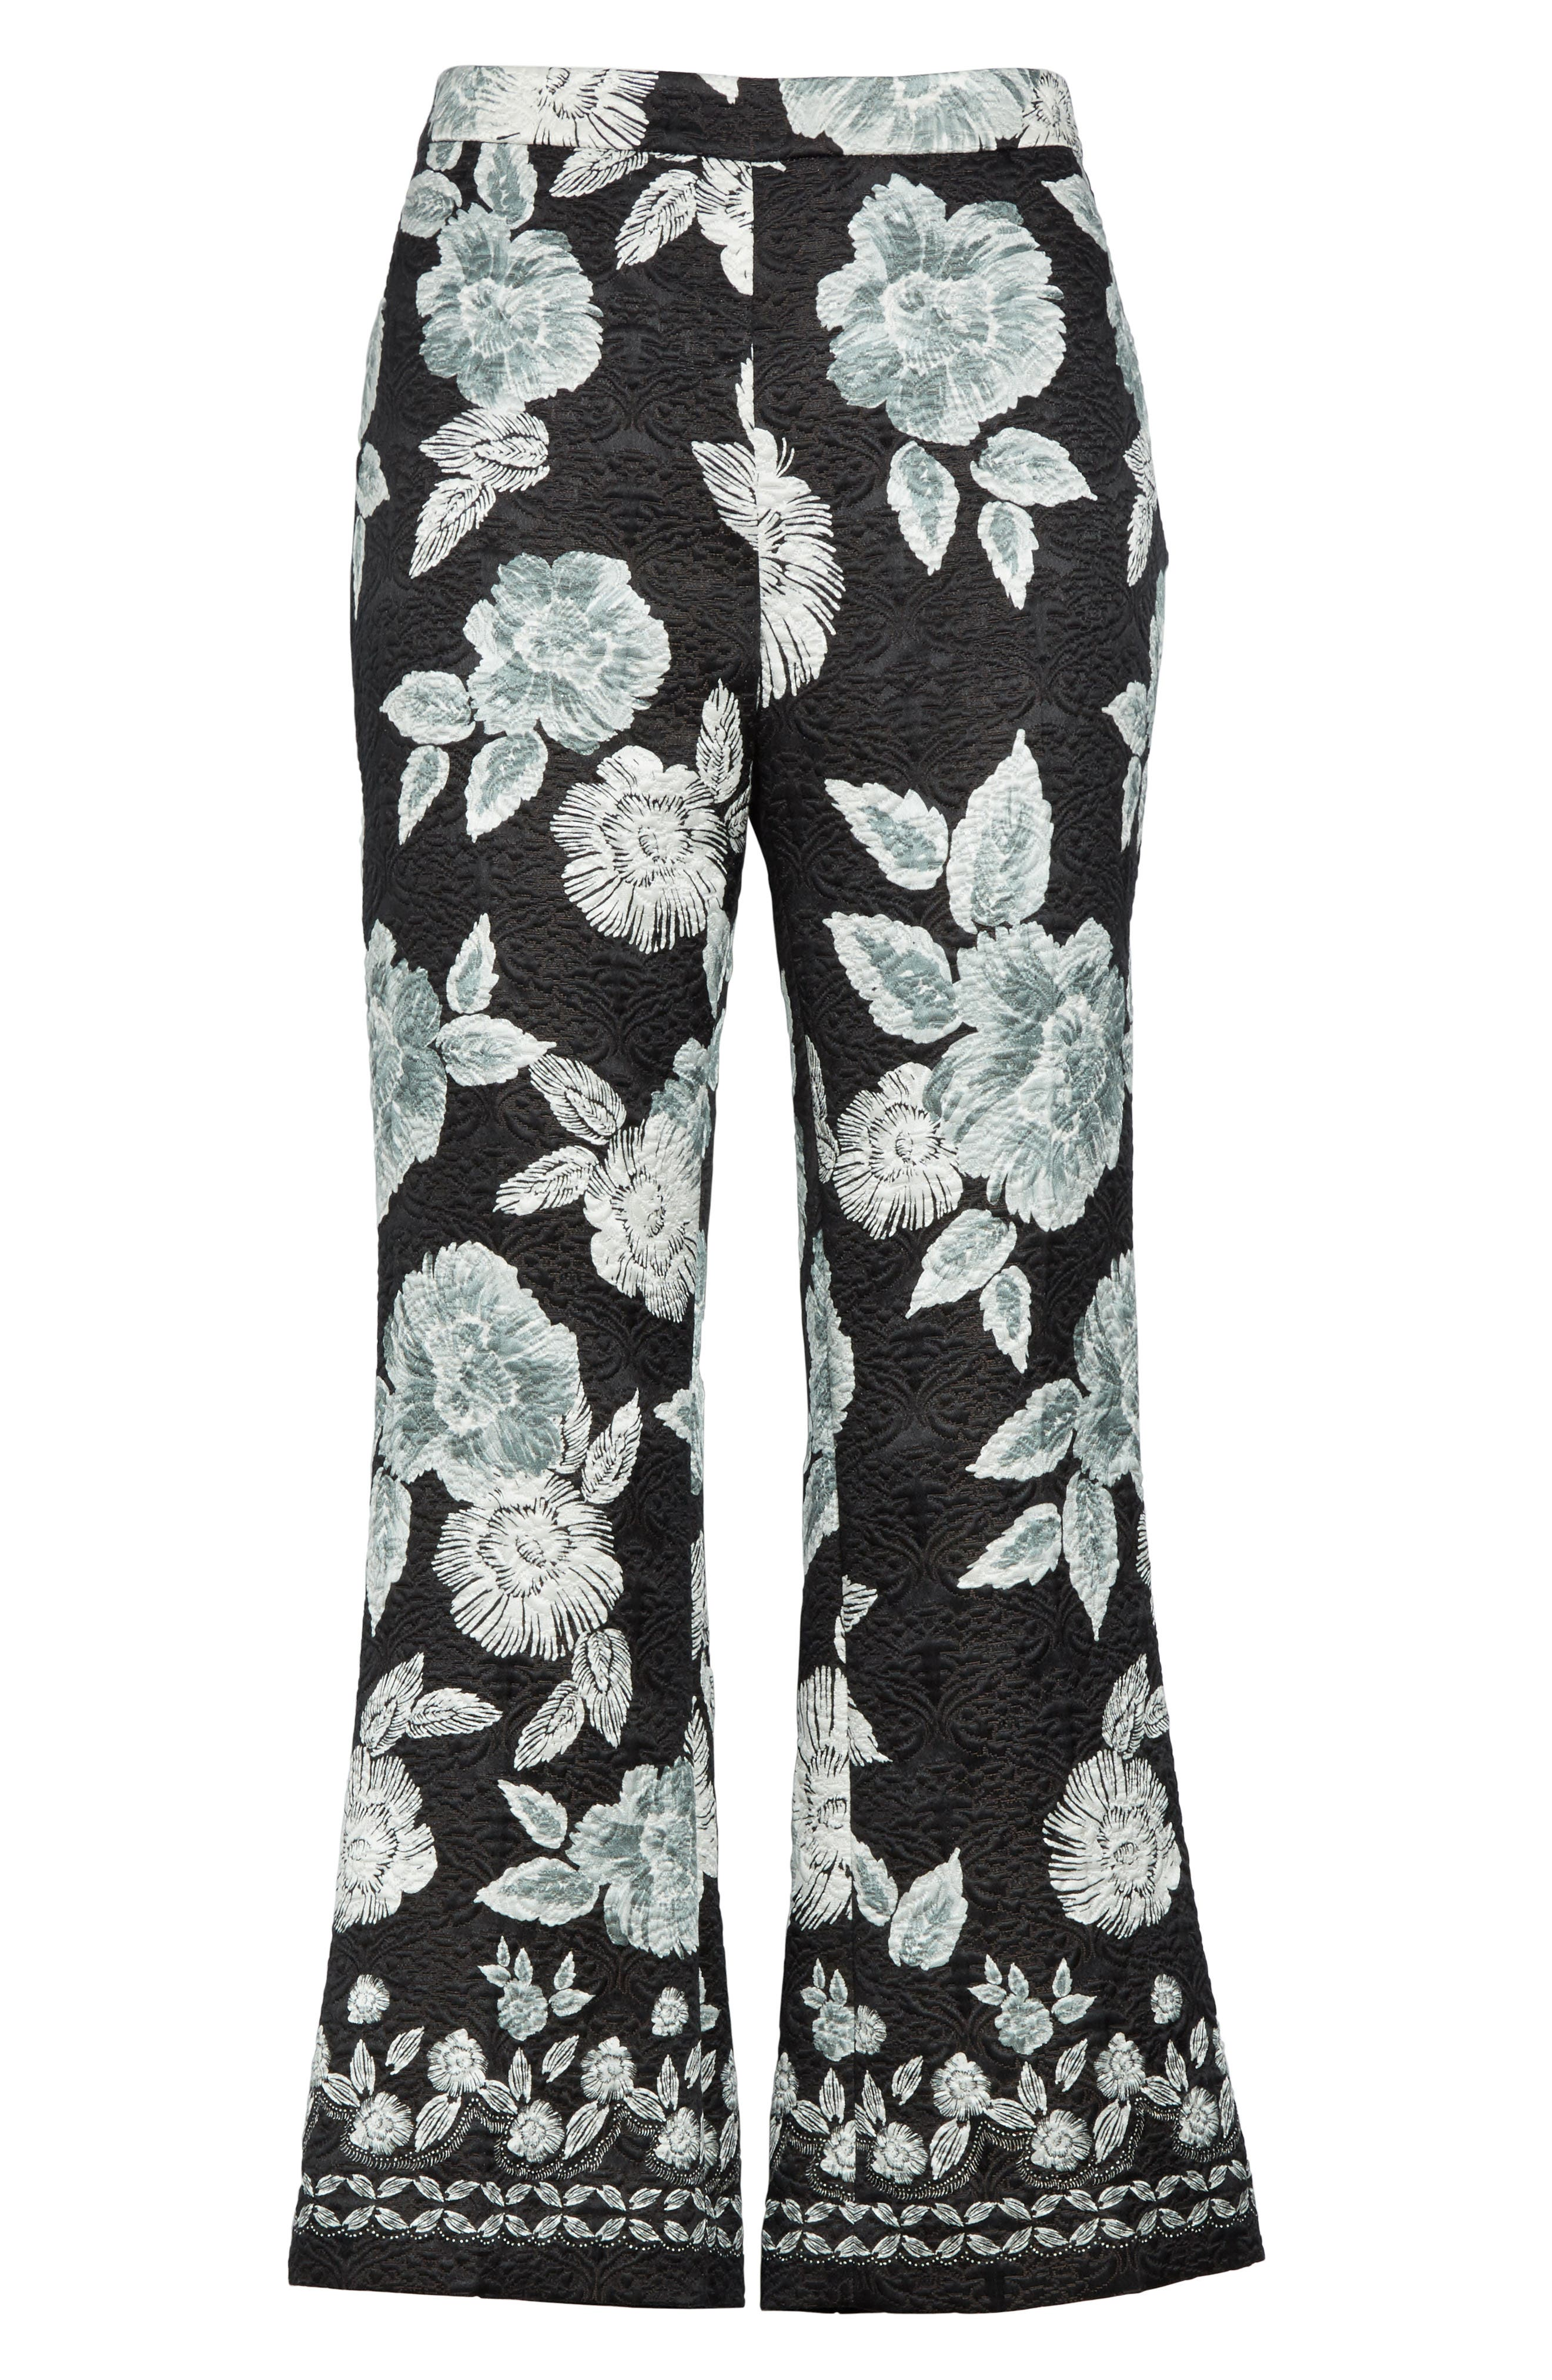 Textured Floral Print Capri Pants,                             Alternate thumbnail 7, color,                             Caviar Multi